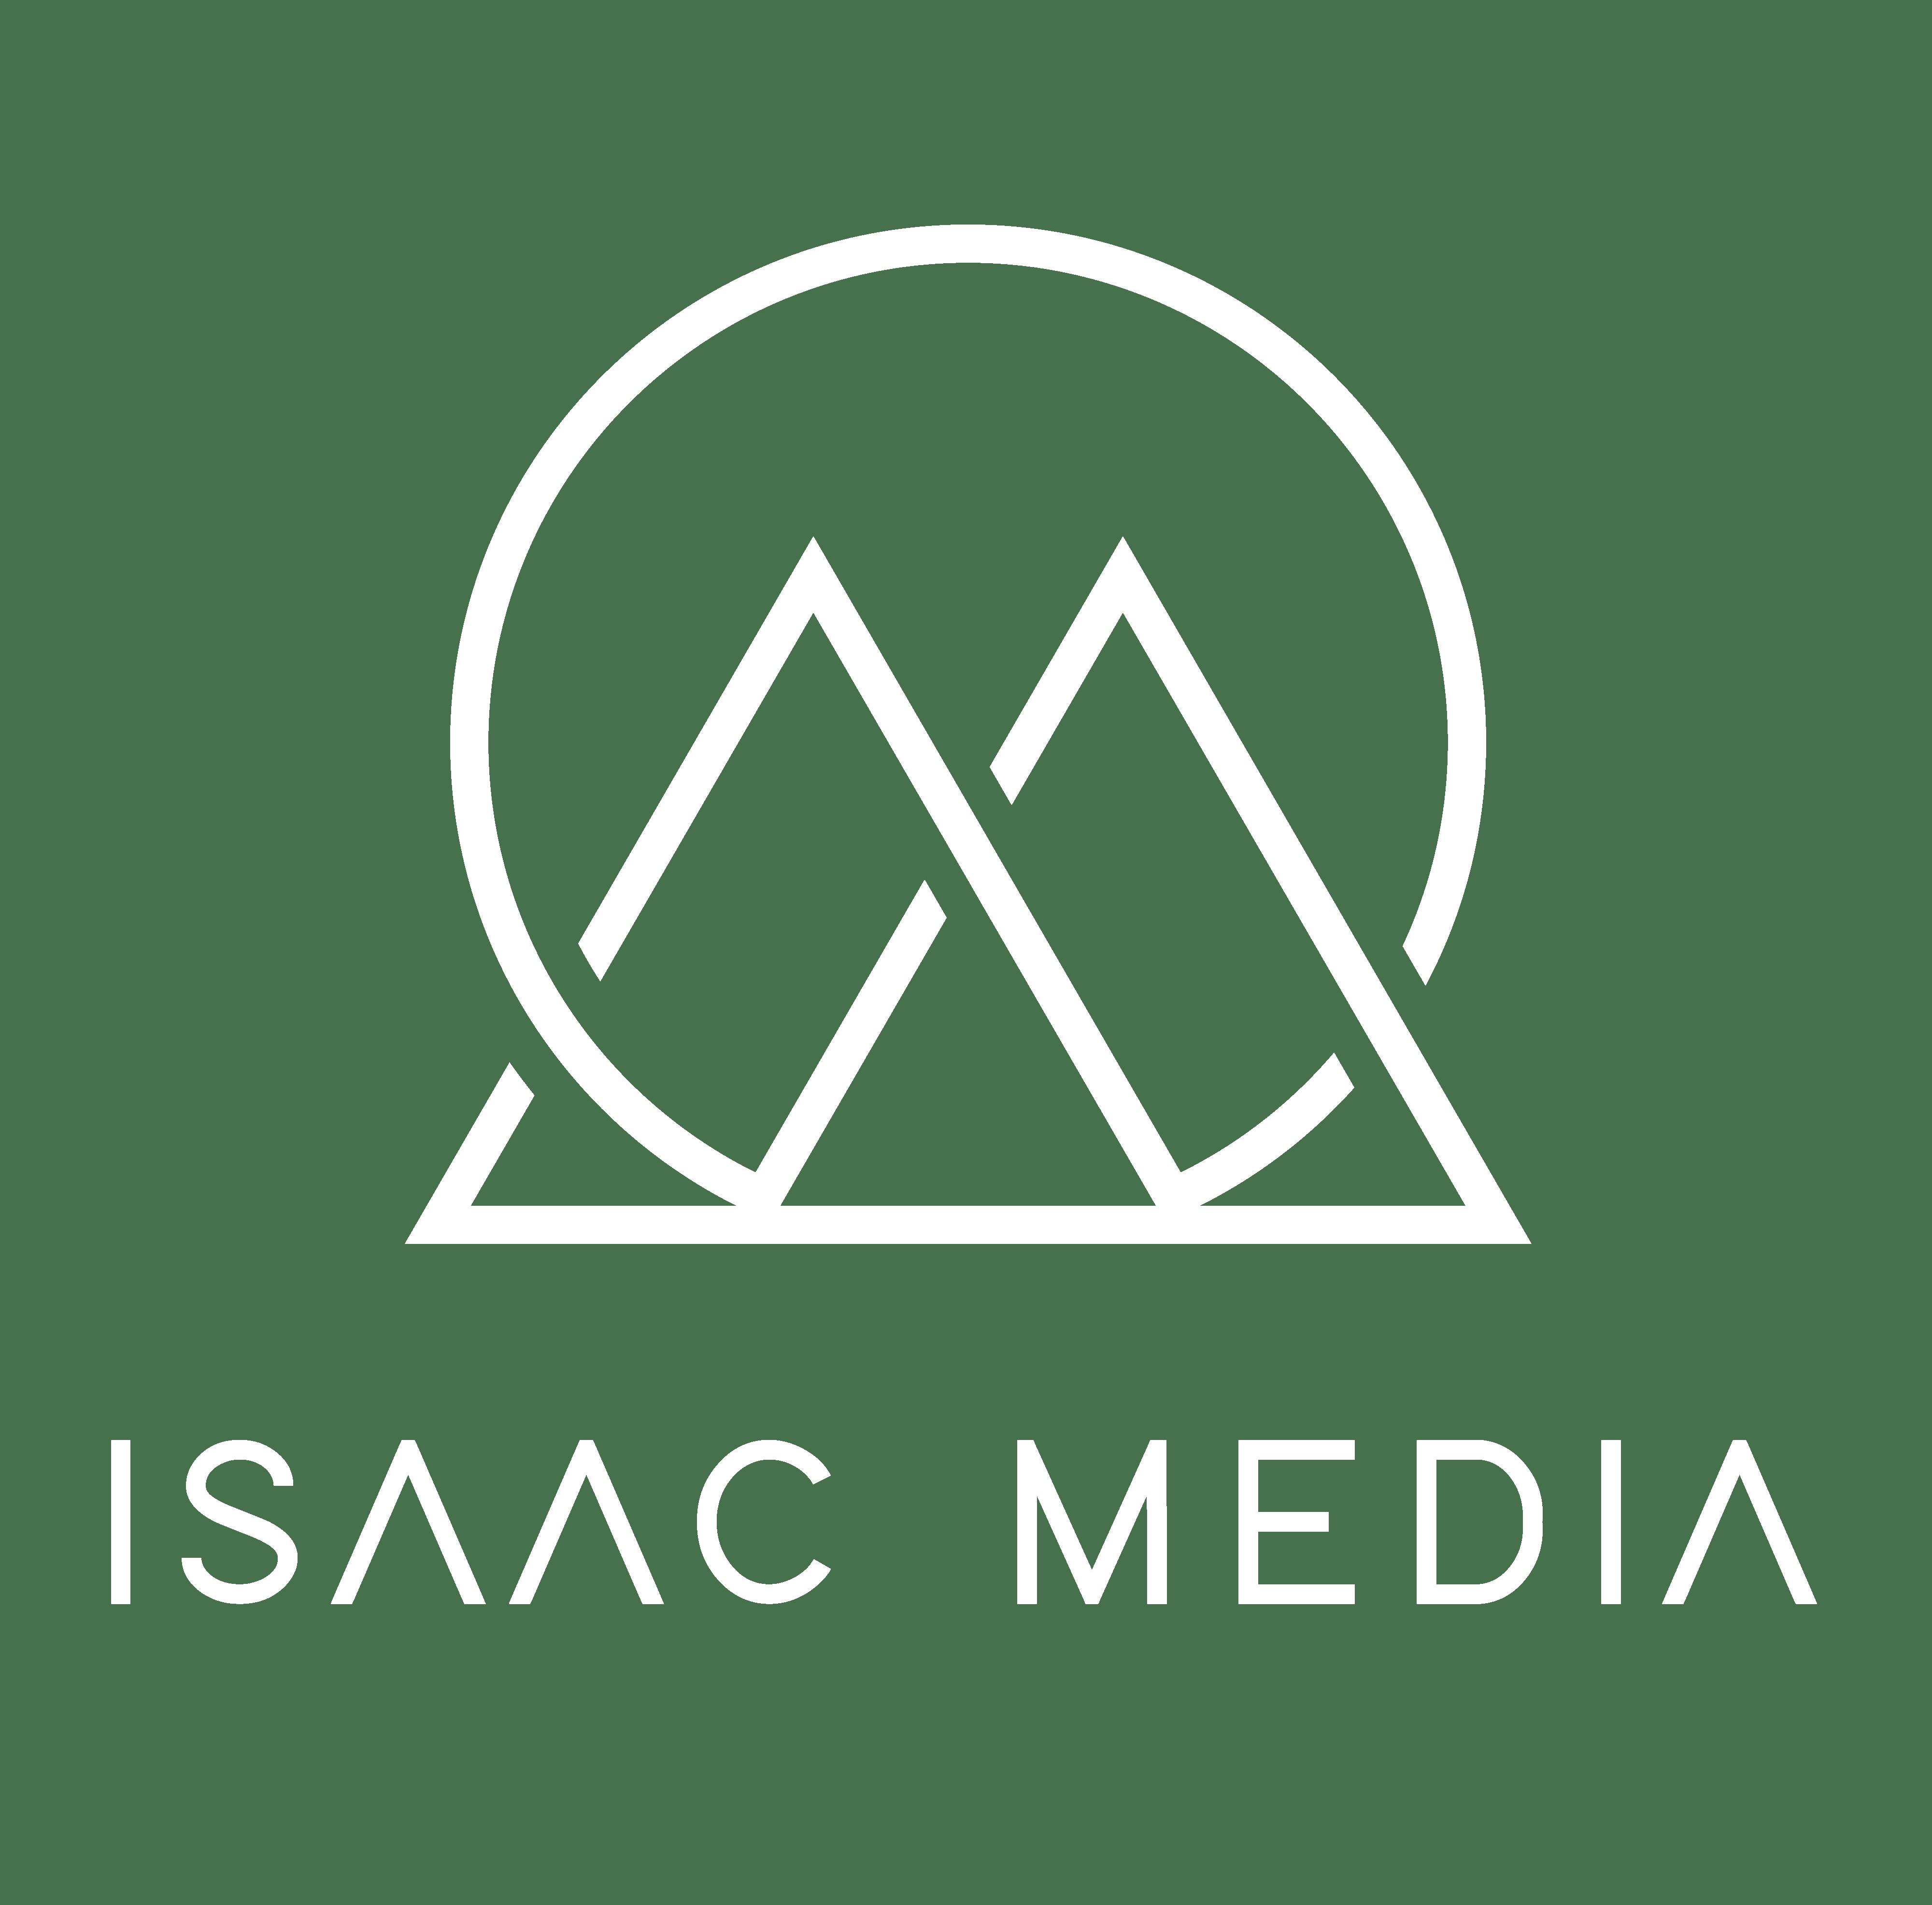 Isaac Media